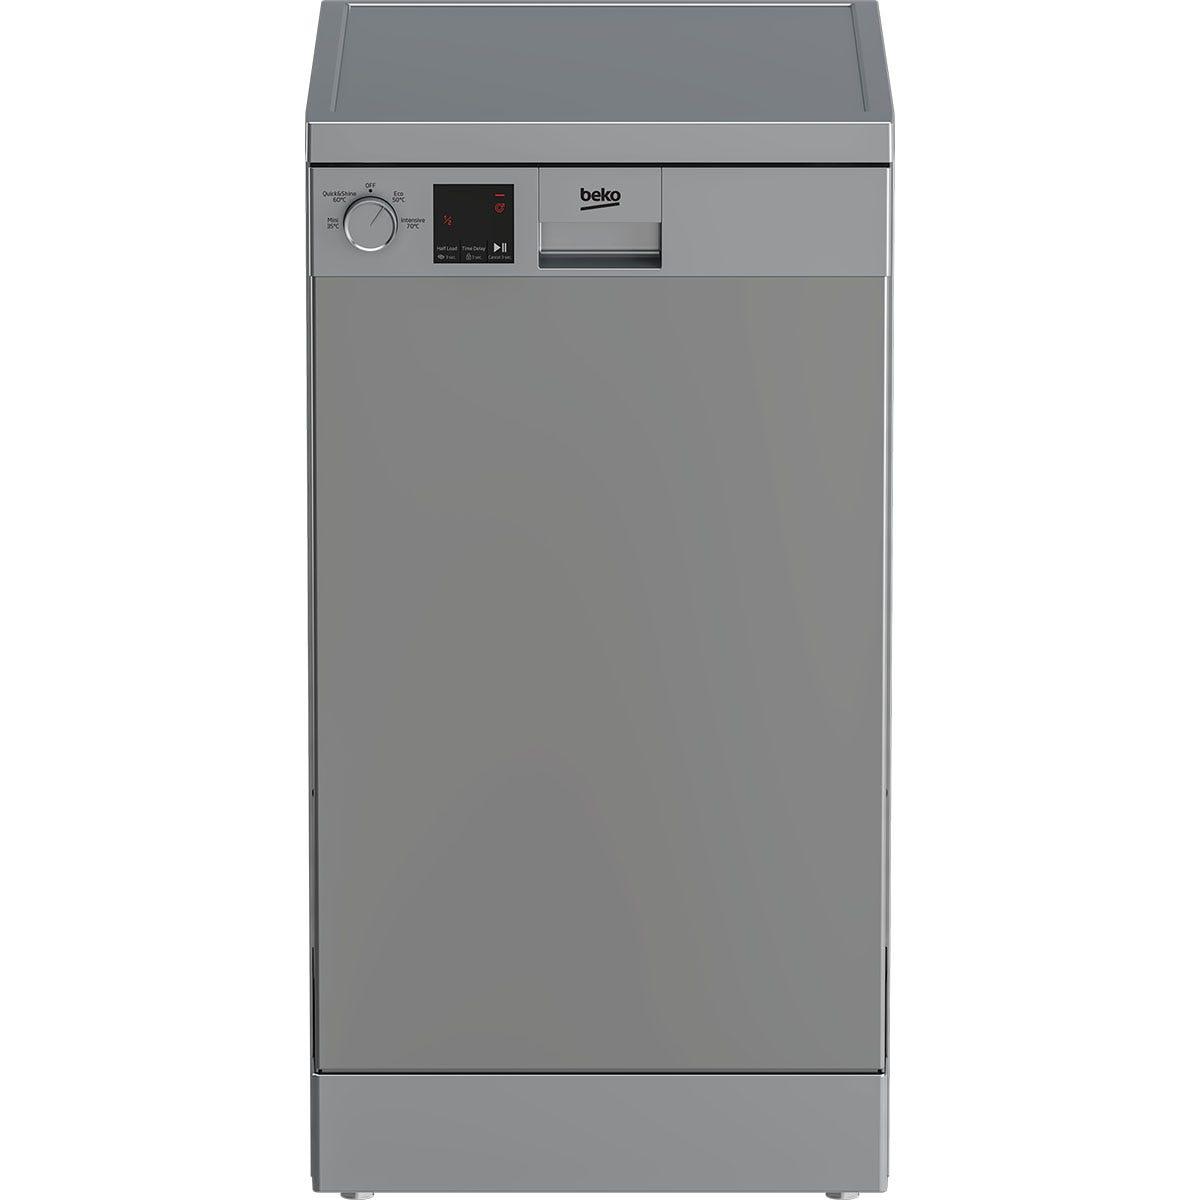 Beko DVS04020S 10 Place Freestanding Slimline 45cm Dishwasher - Silver